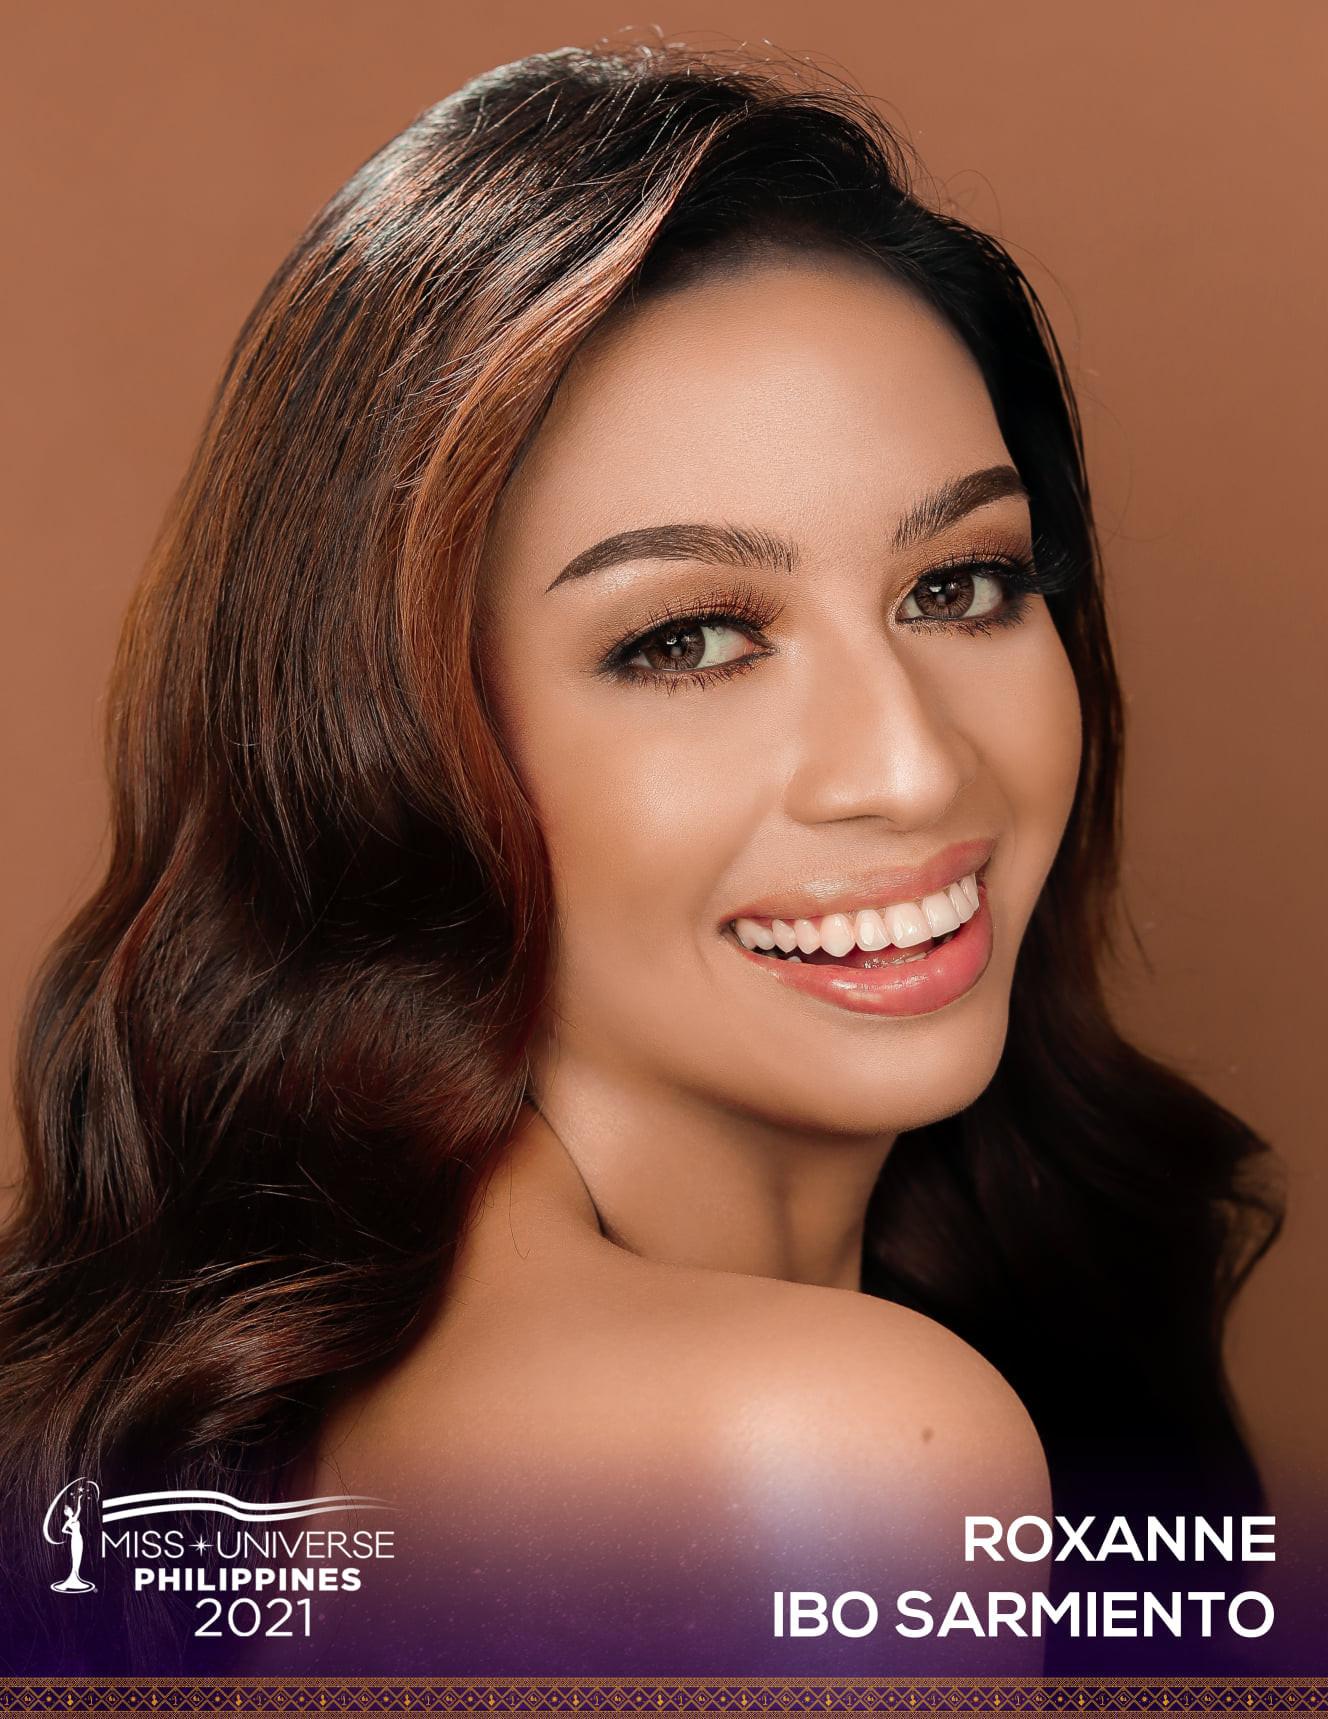 pre-candidatas a miss universe philippines 2021. - Página 2 AlKzf2